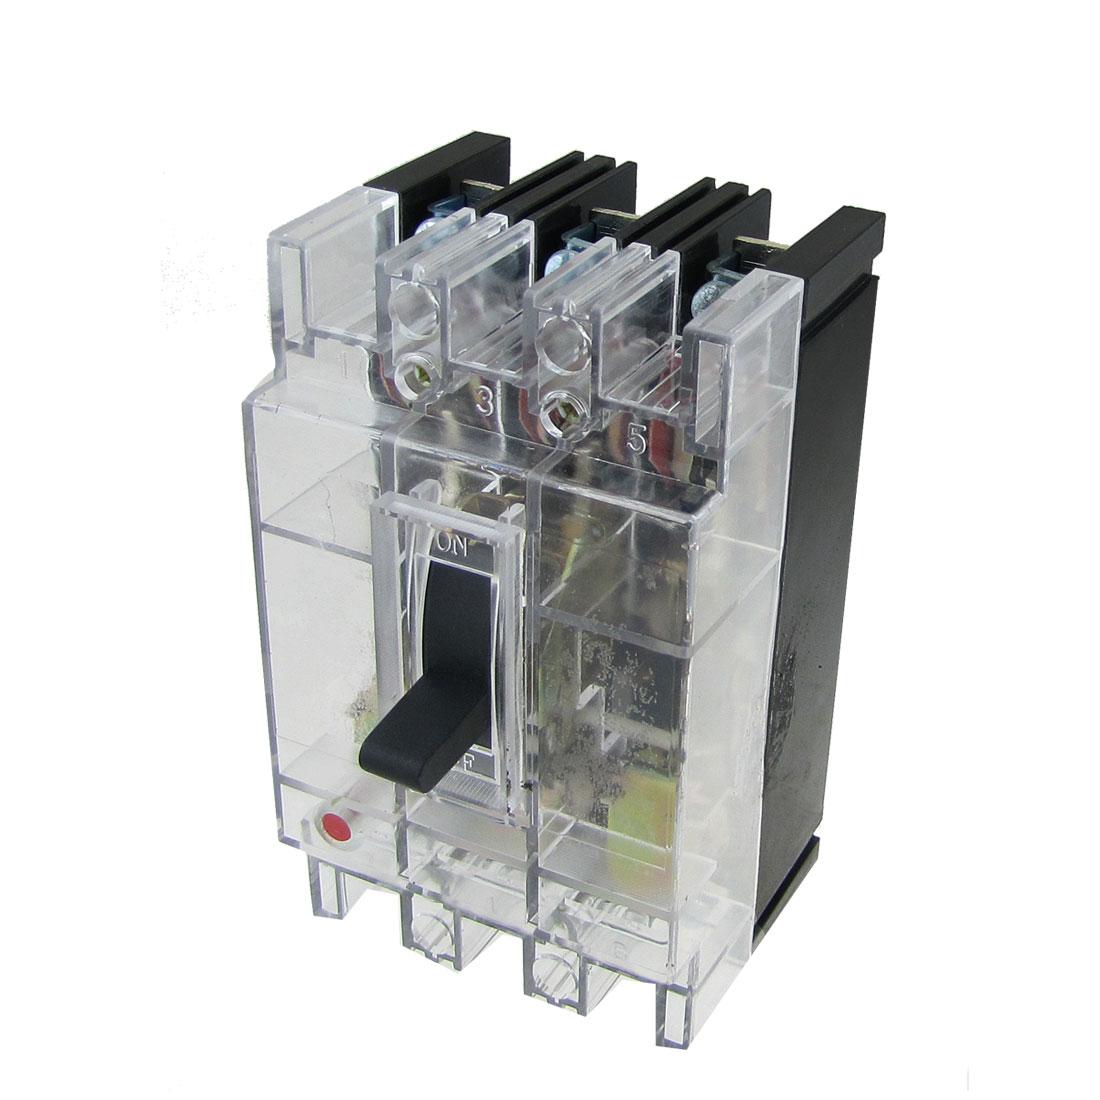 Transparent AC 380V 40A Amps 3 Poles 3P MCCB Moulded Case Circuit Breaker